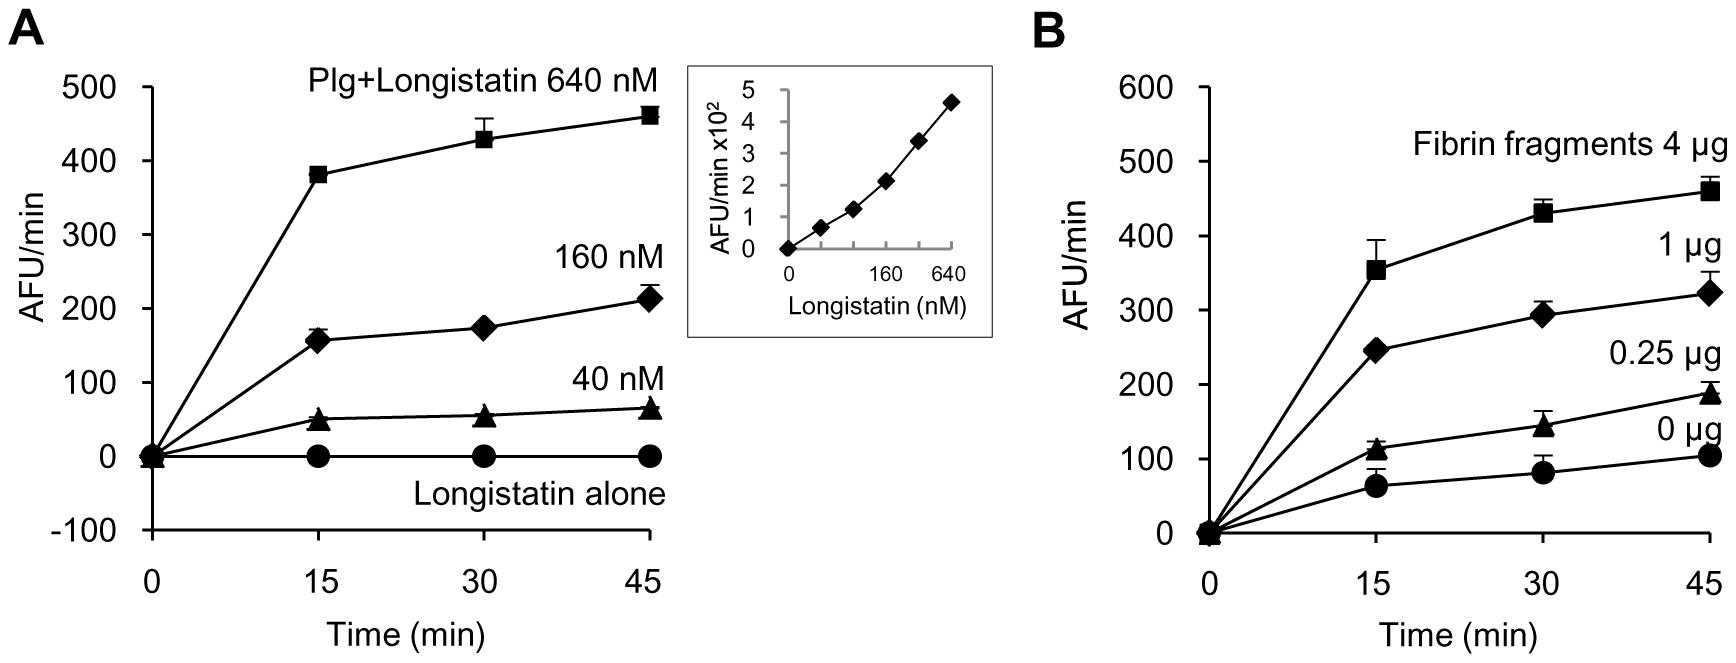 Plasminogen activation by longistatin.